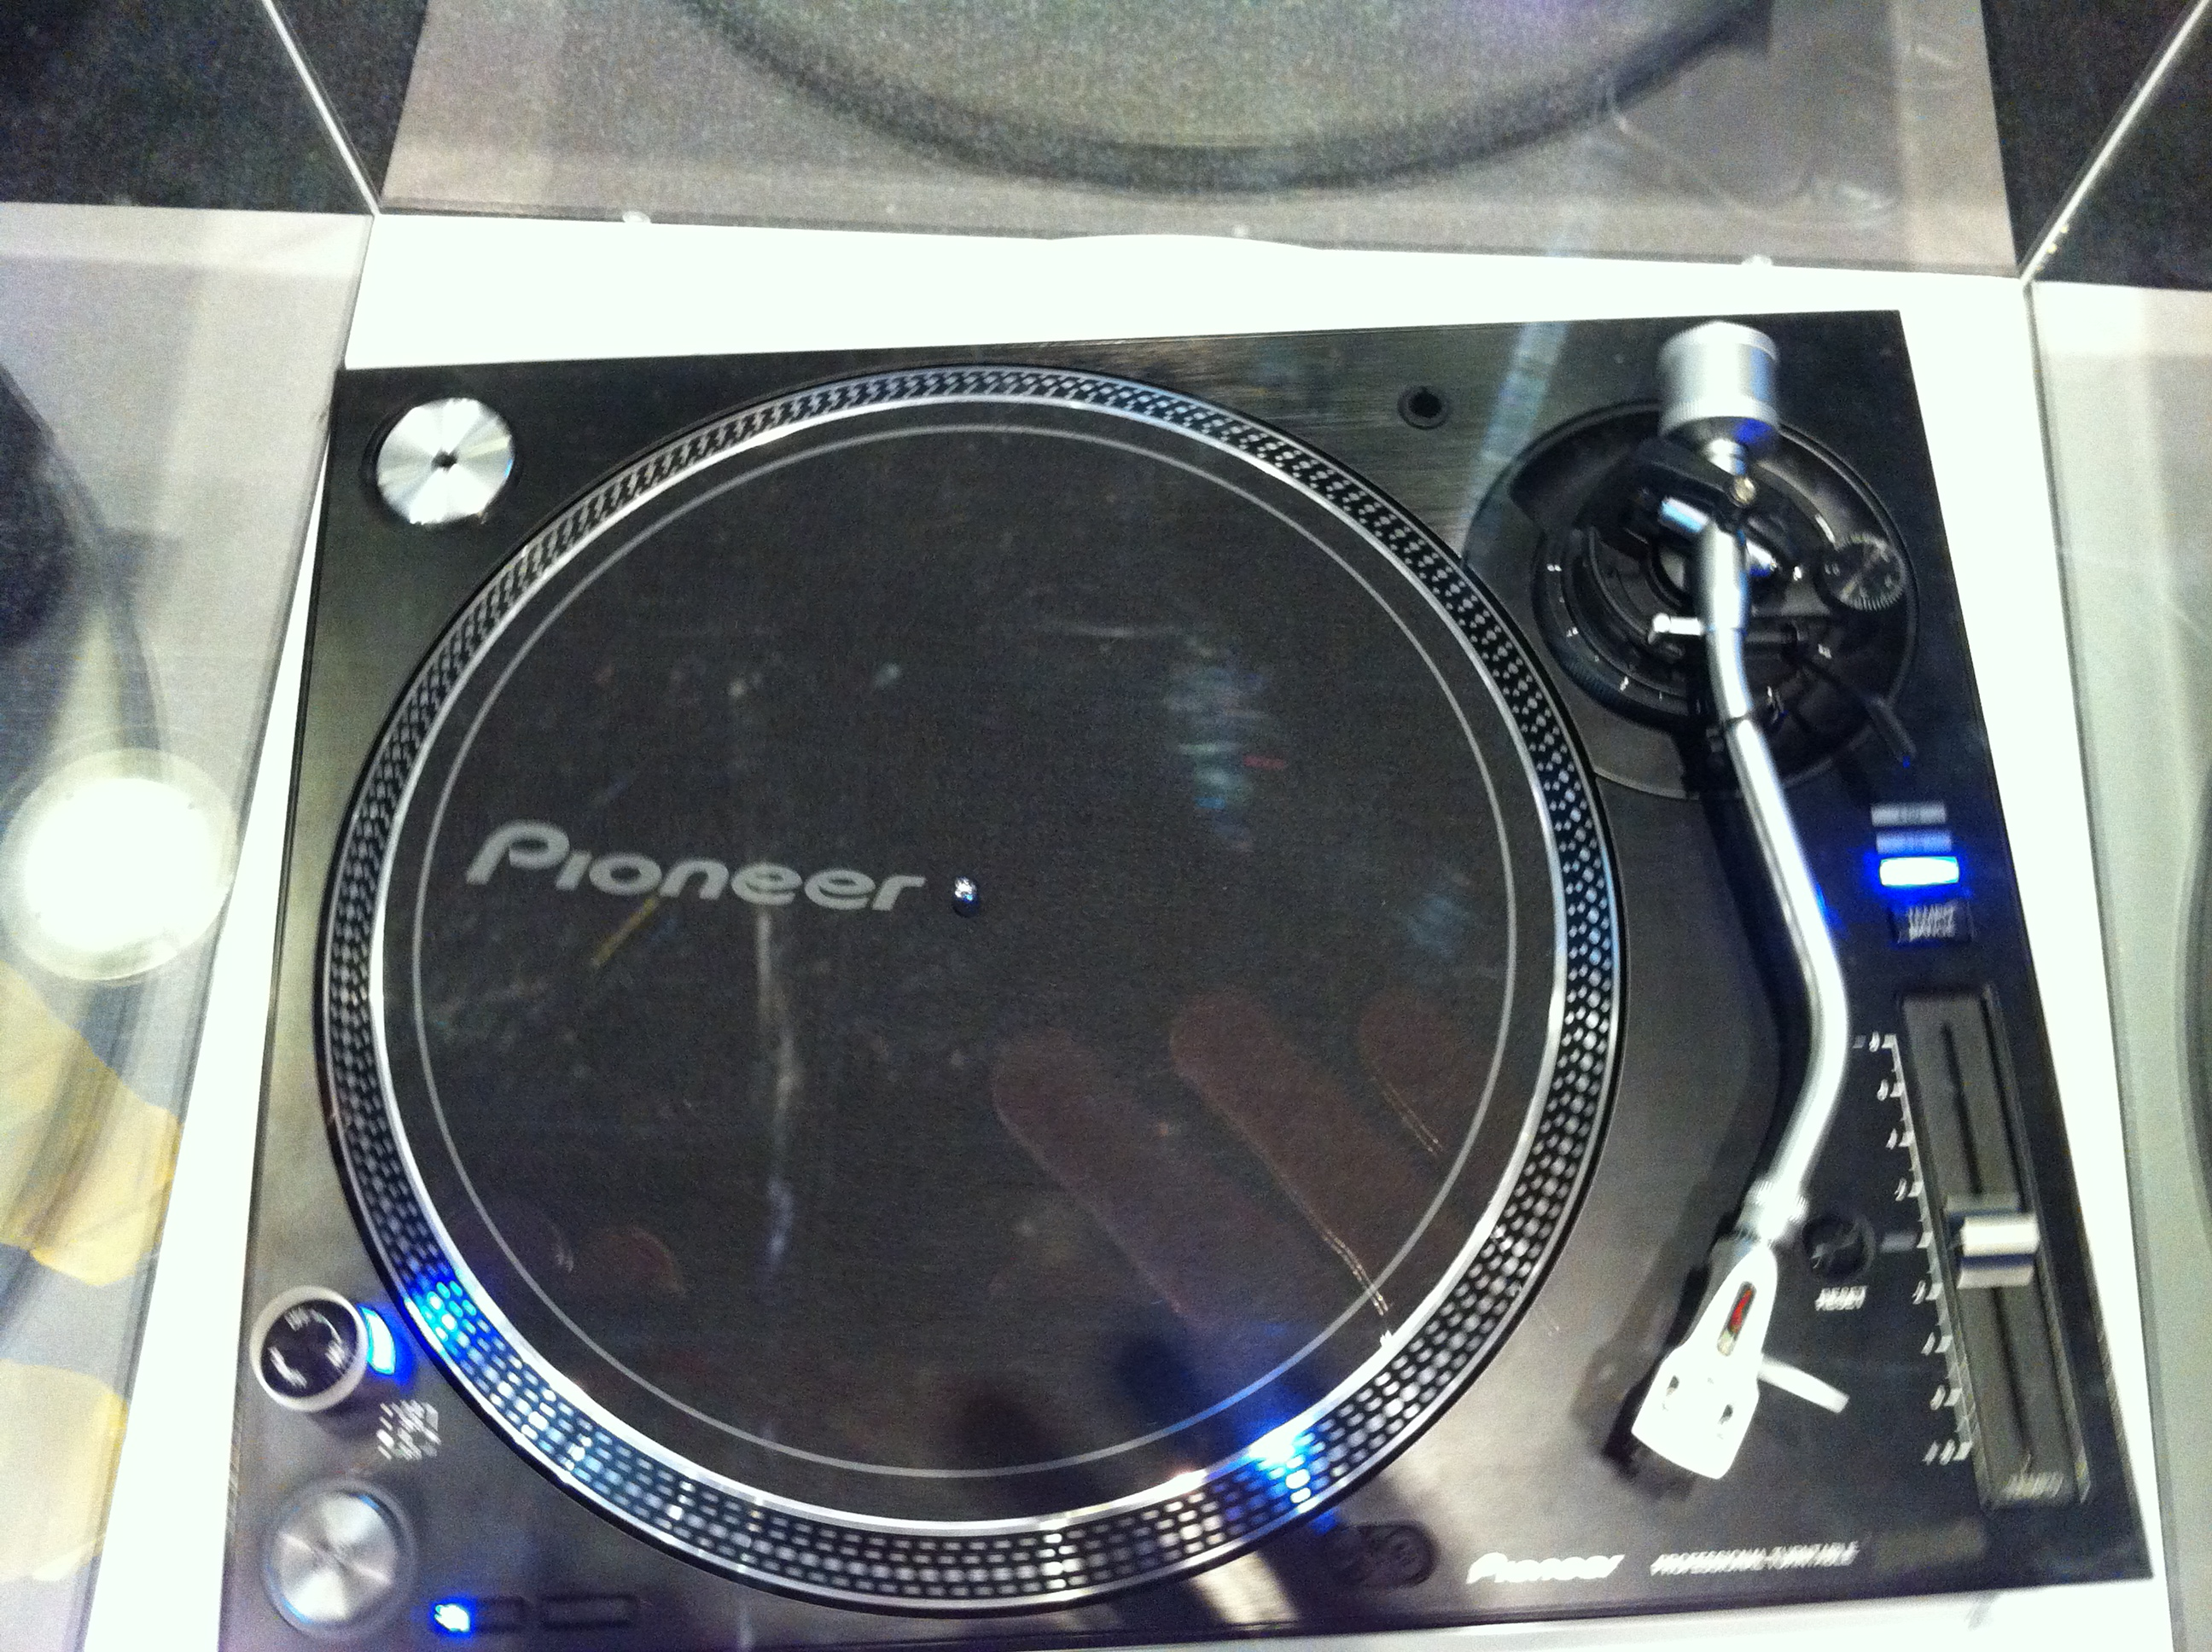 34_PioneerTurntable2